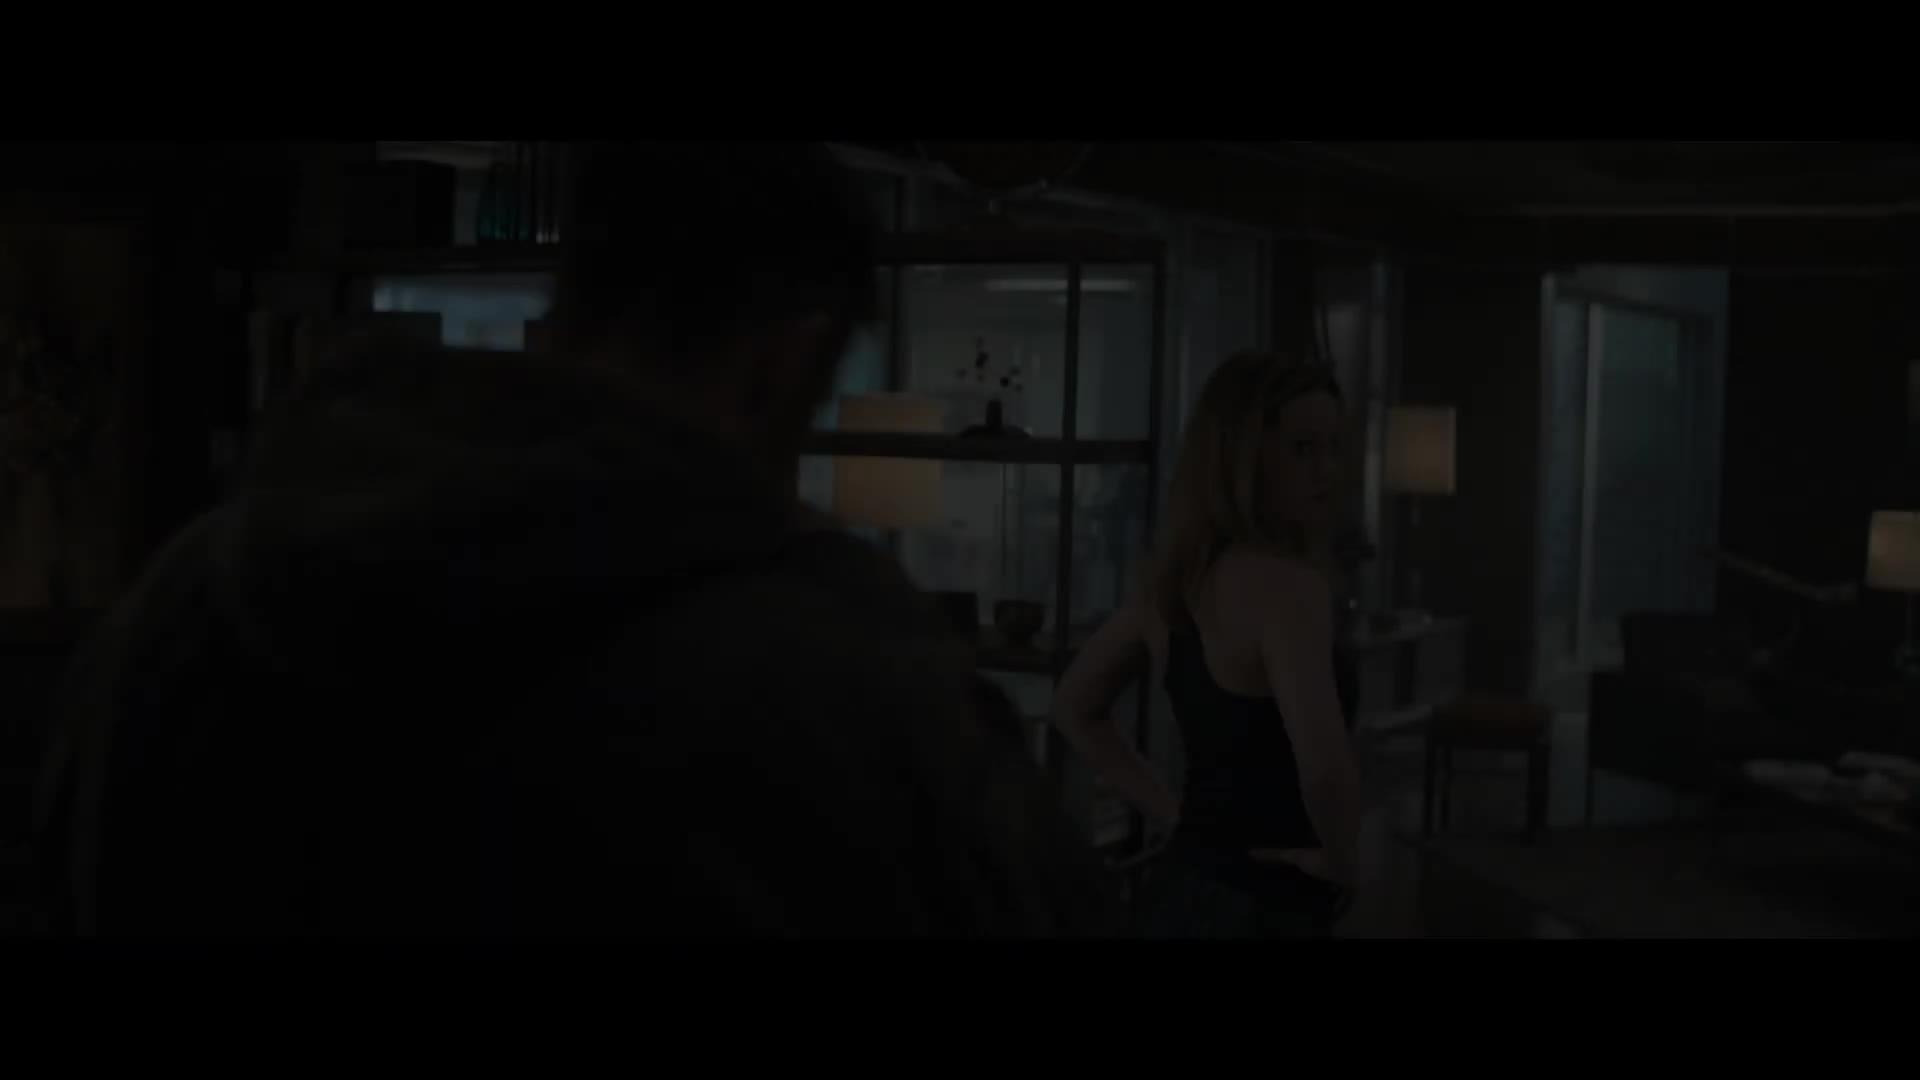 avengers, avengers 4, avengers endgame, avengers endgame trailer, captain marvel, celebs, chris hemsworth, comics, endgame, marvel, mcu, thanos, Marvel Studios' Avengers: Endgame - Official Trailer GIFs